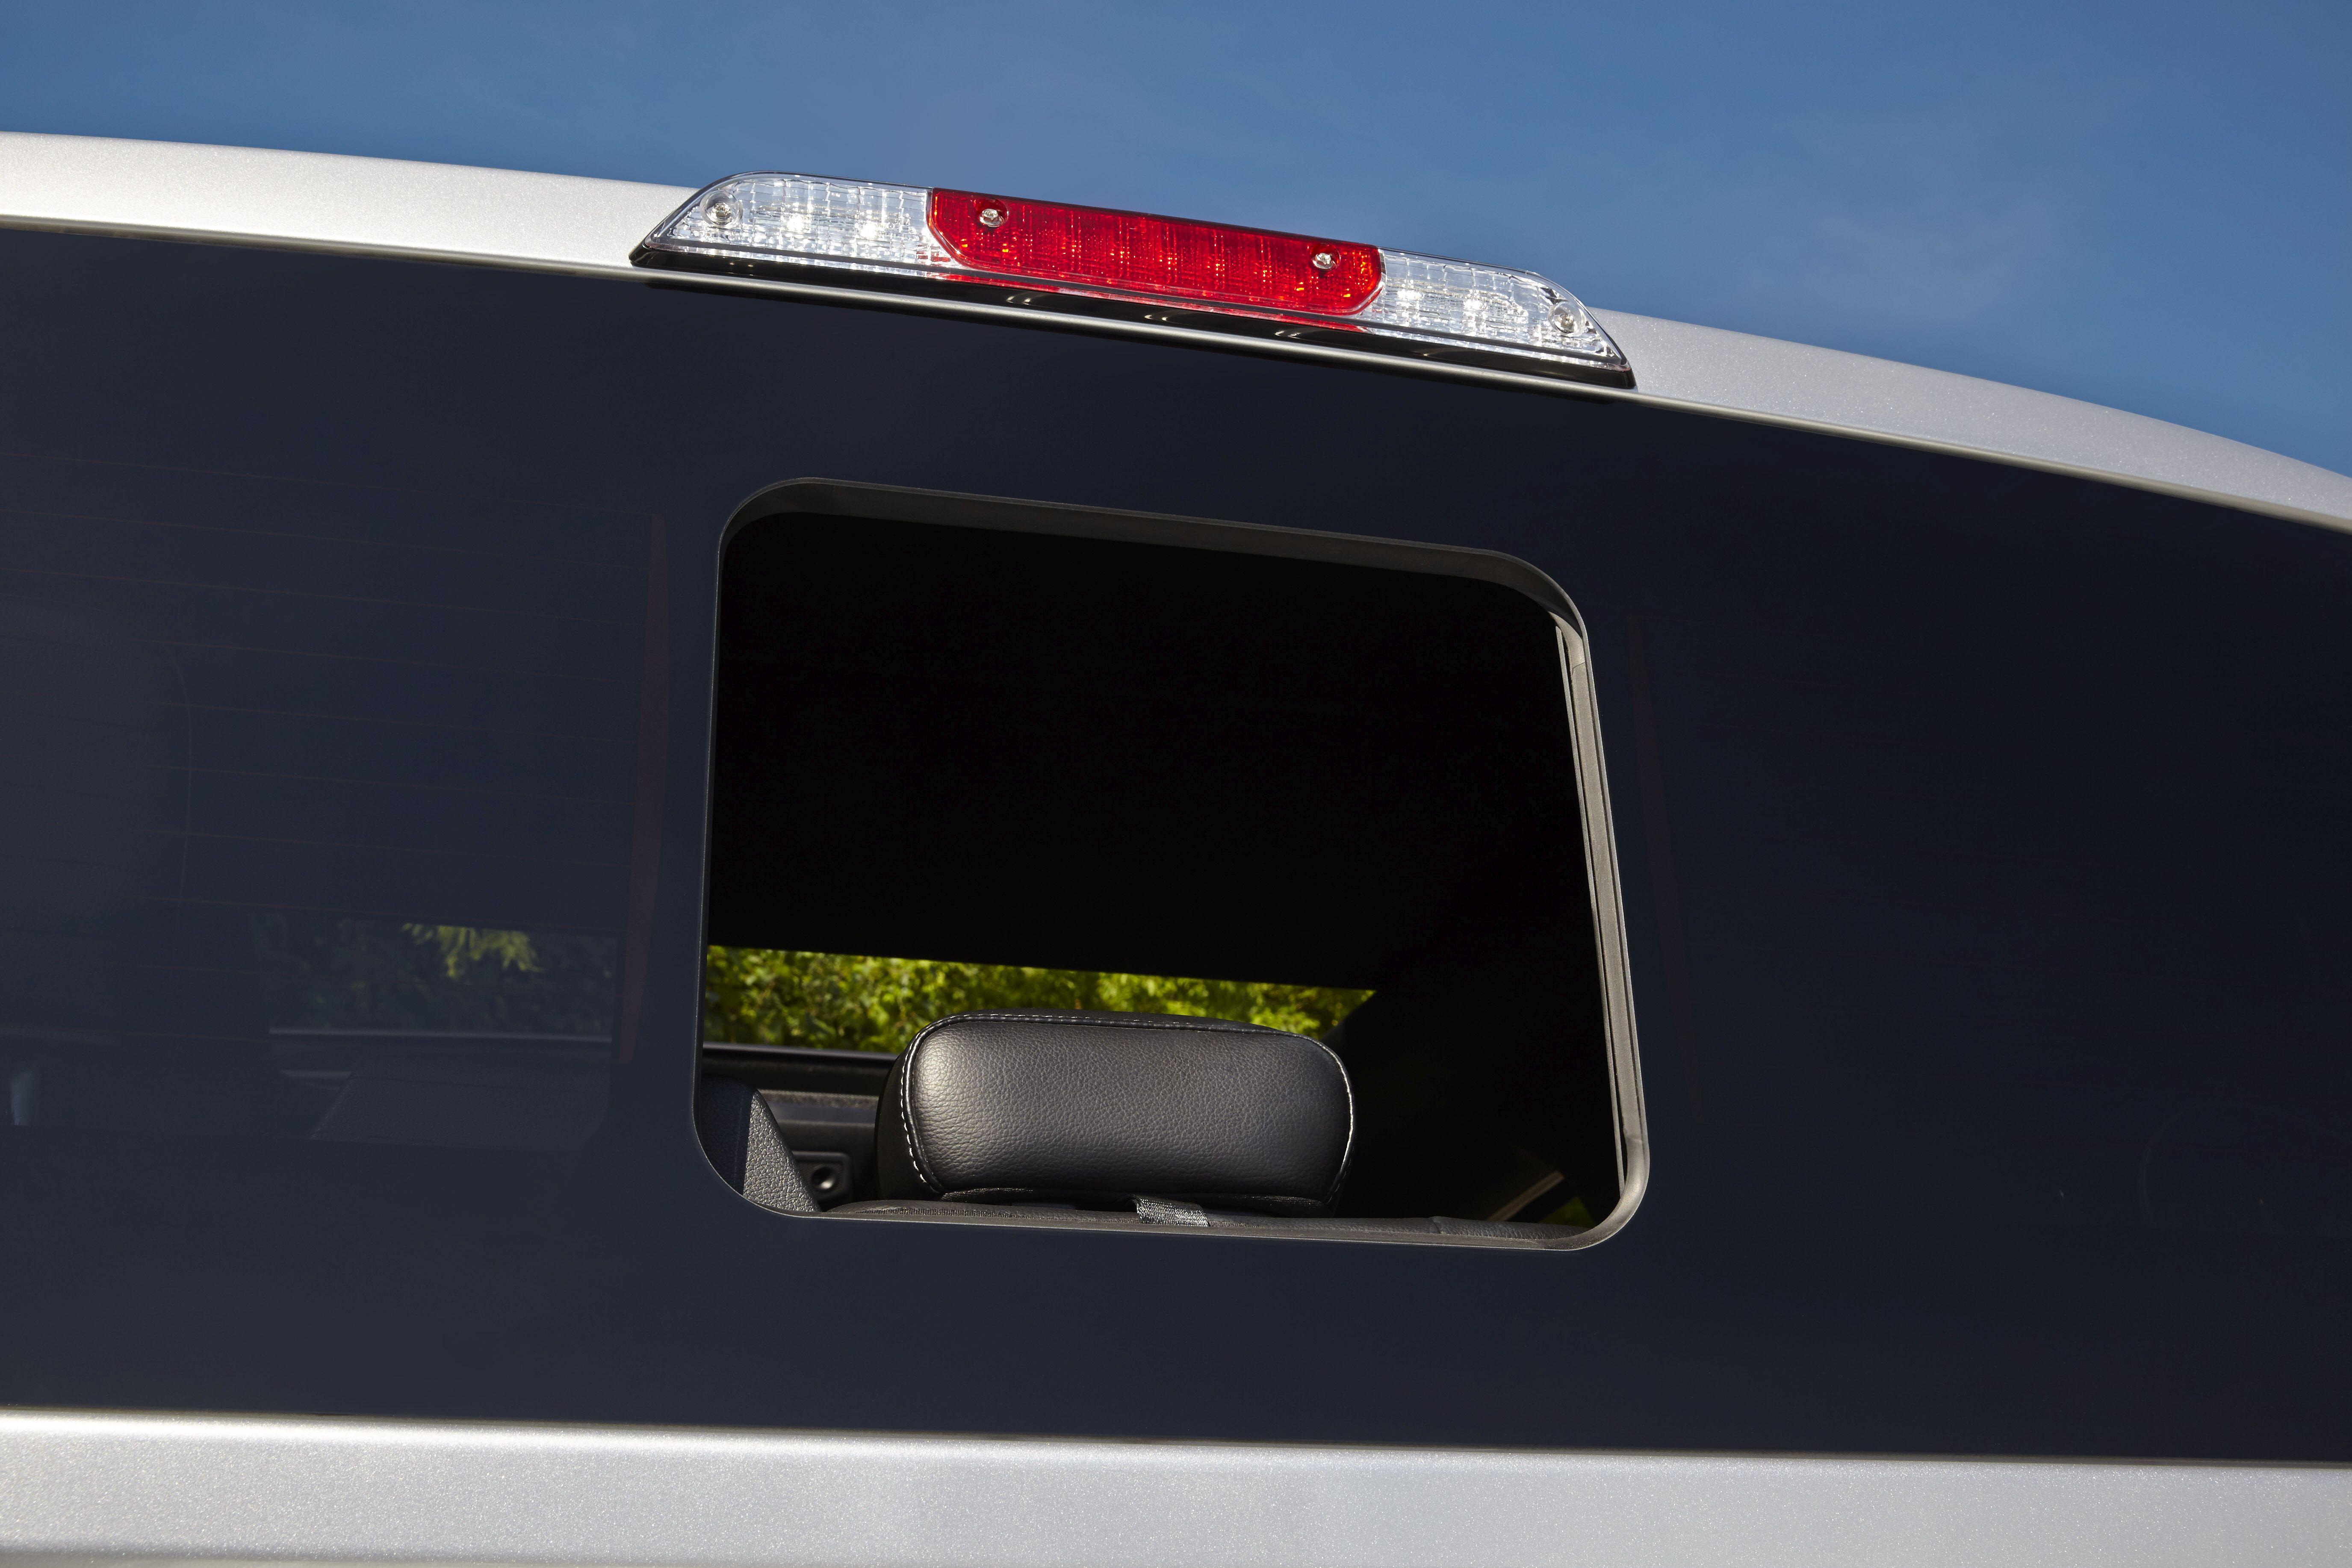 2015 F-150 Gets Seamless Sliding Rear Window